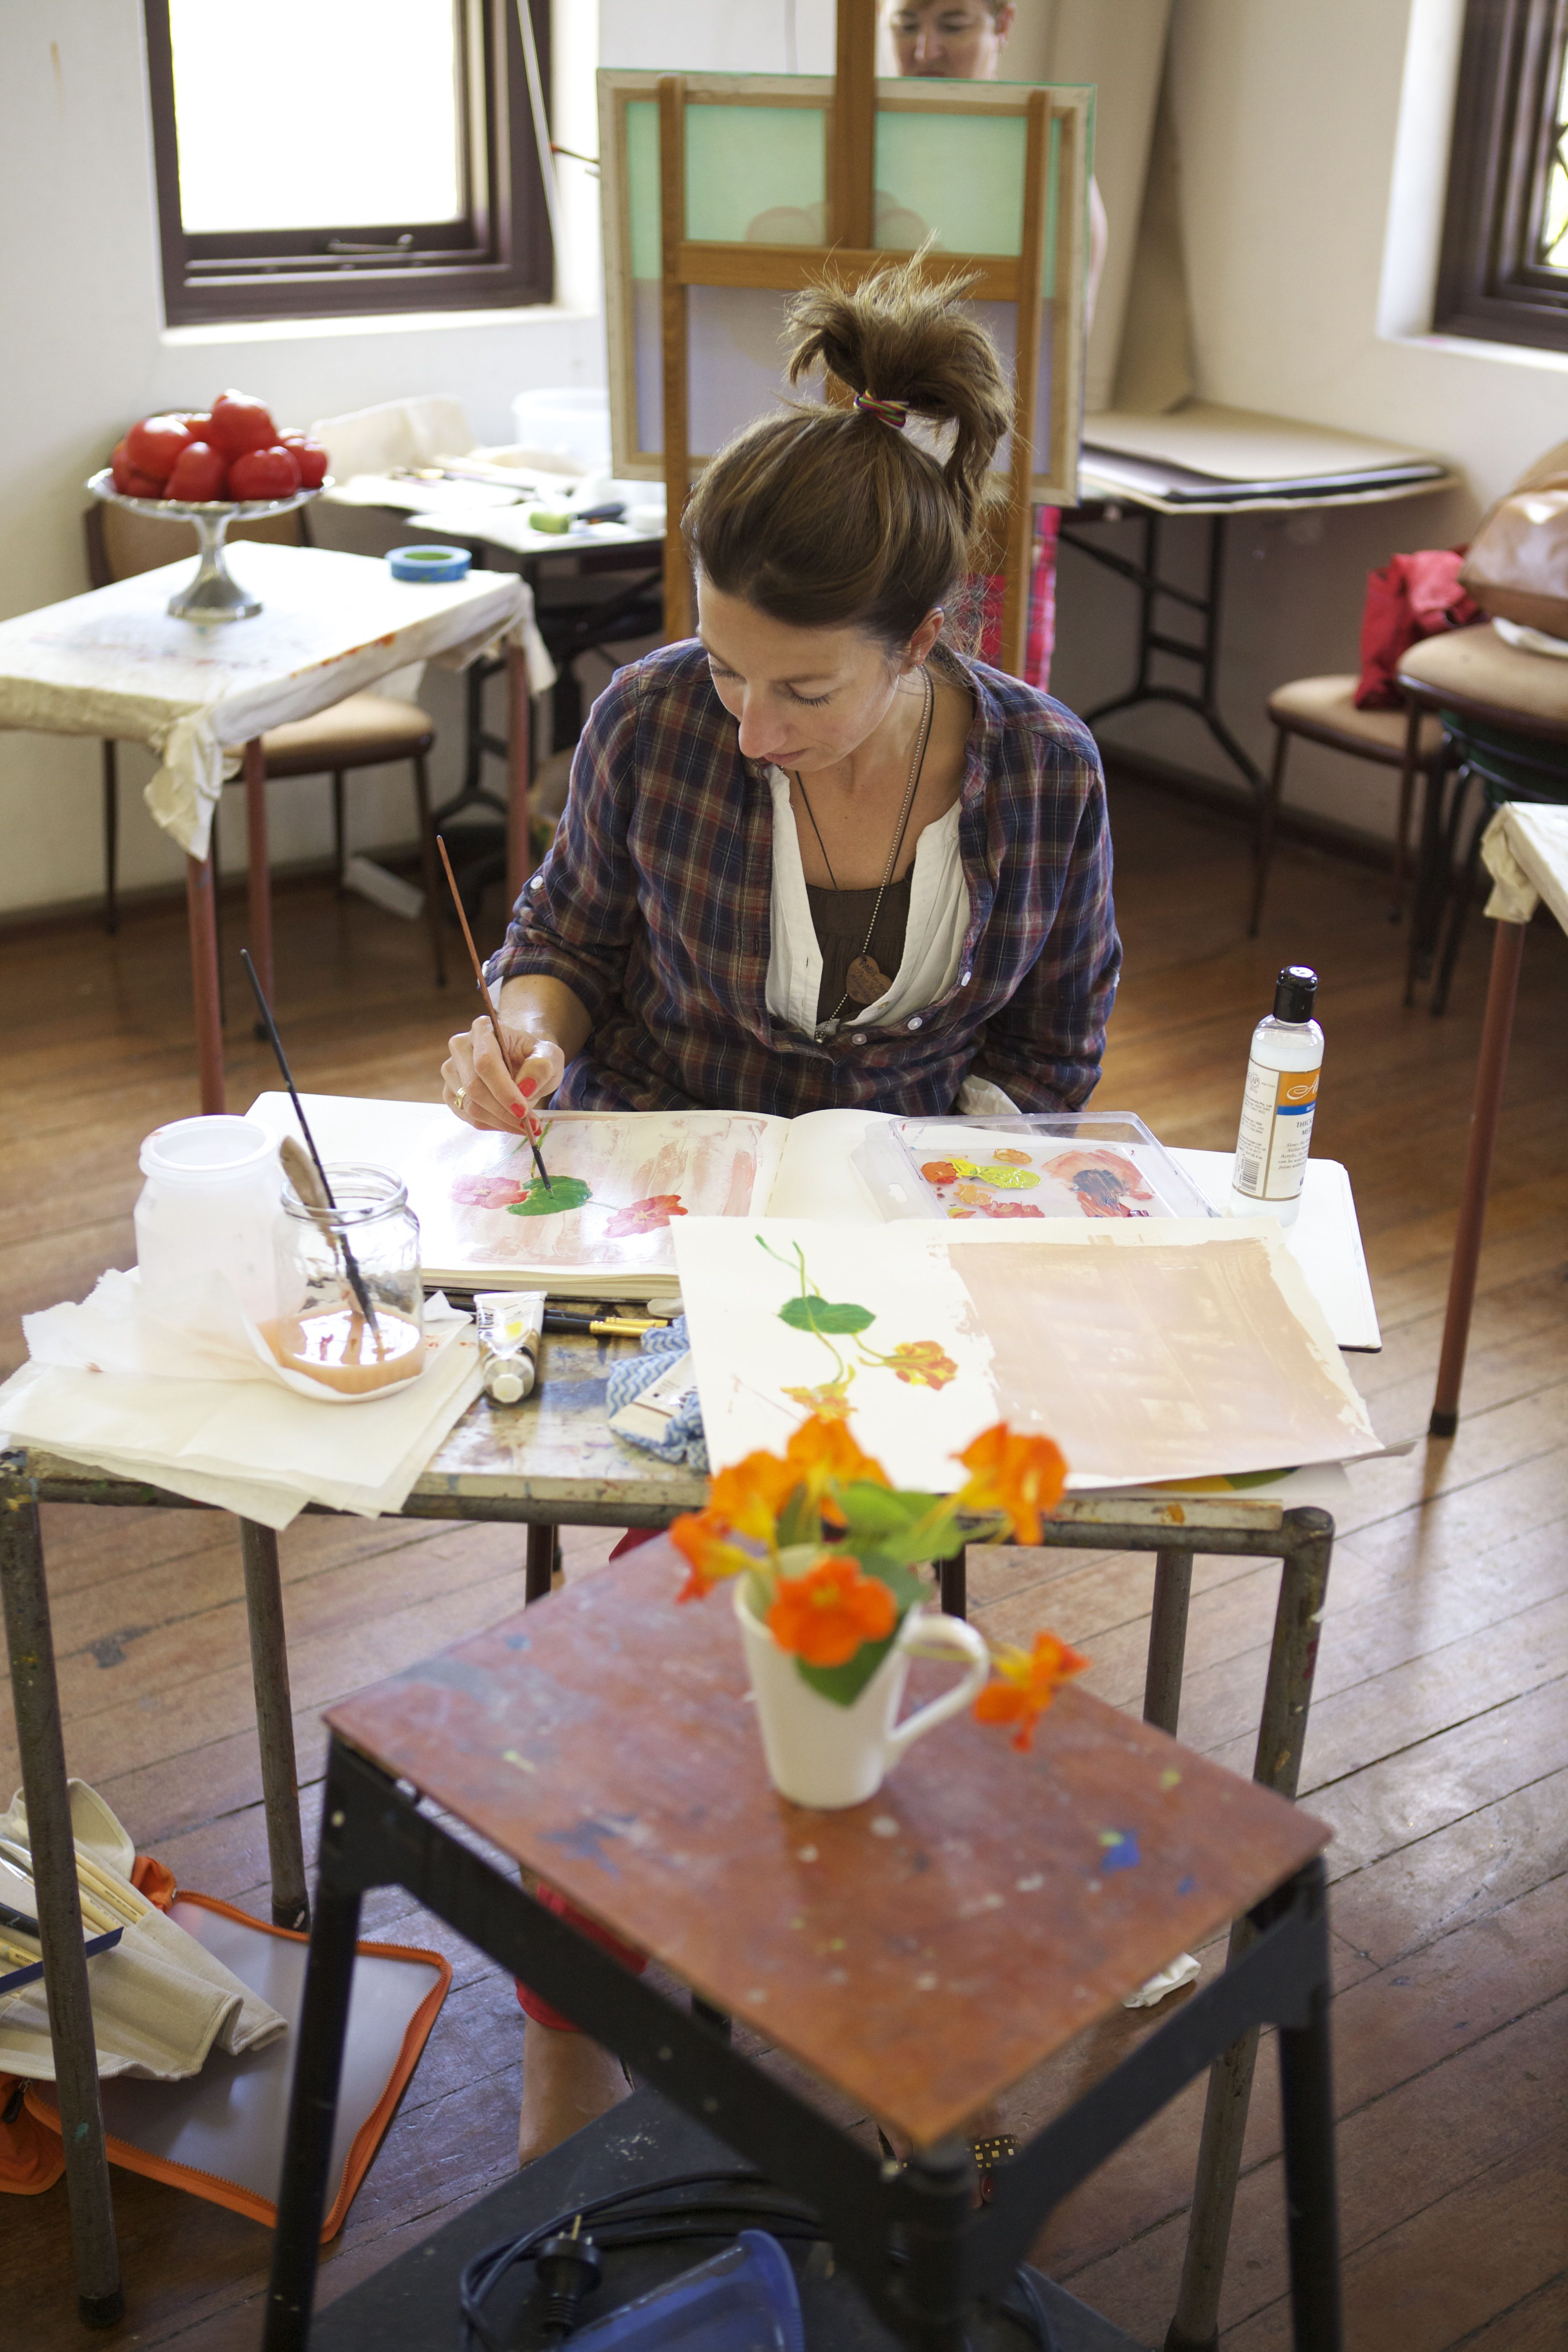 Painting   Art courses, Art classes, Heritage building